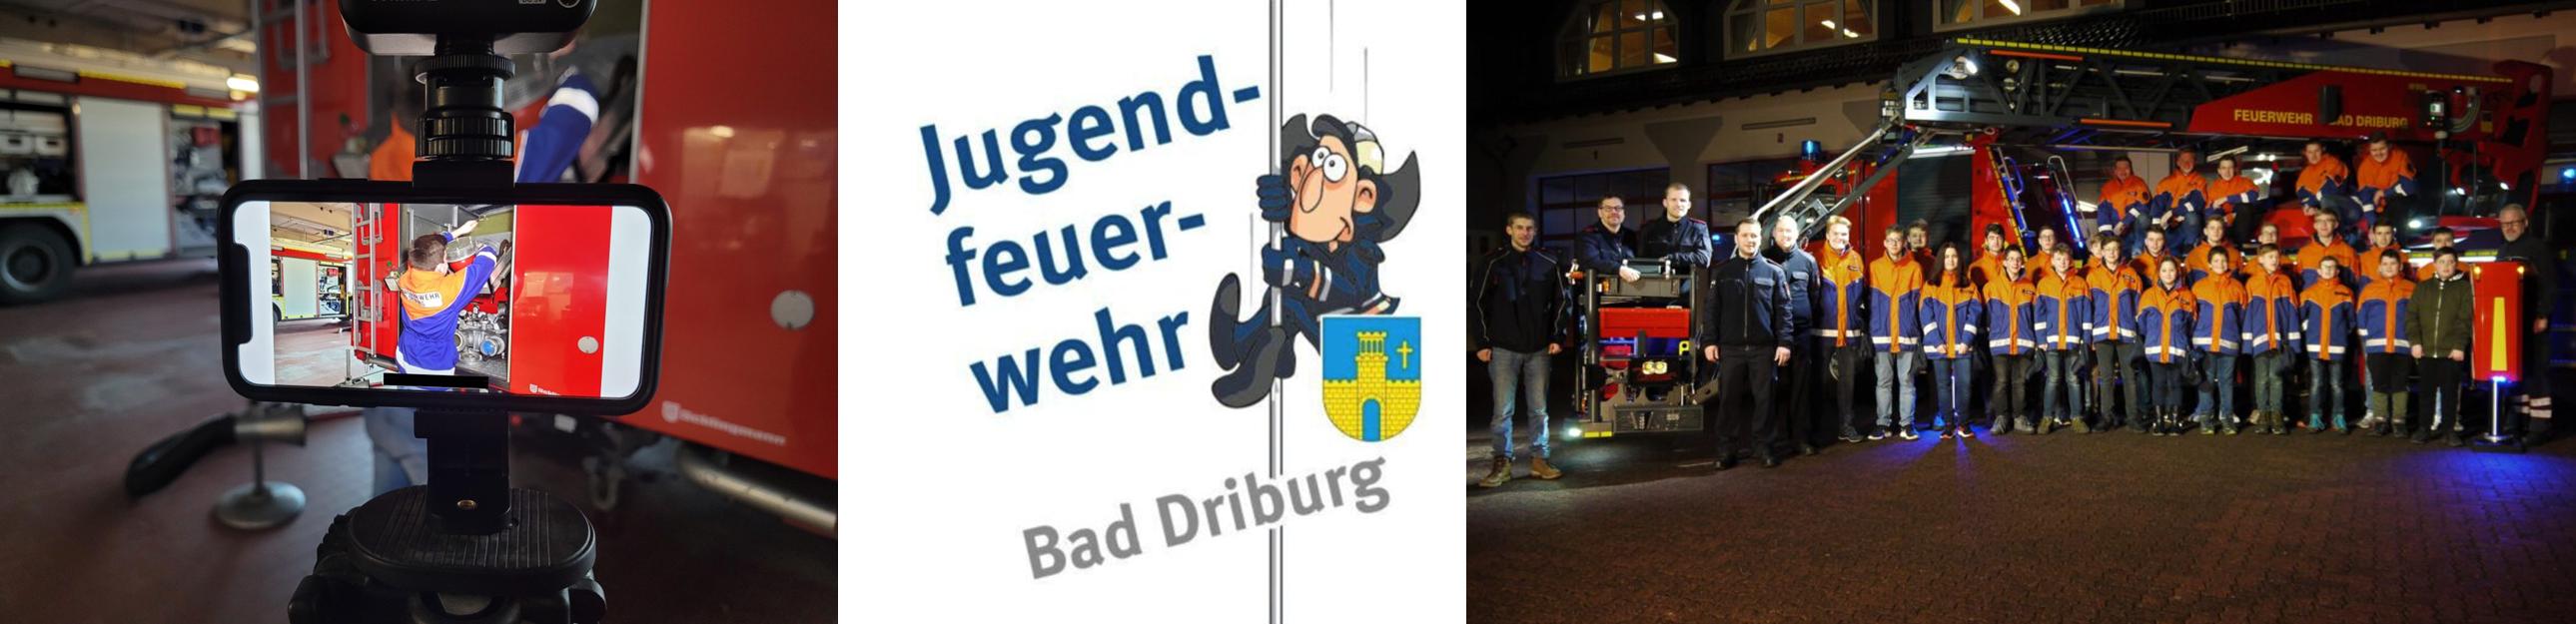 Jugendfeuerwehr Bad Driburg